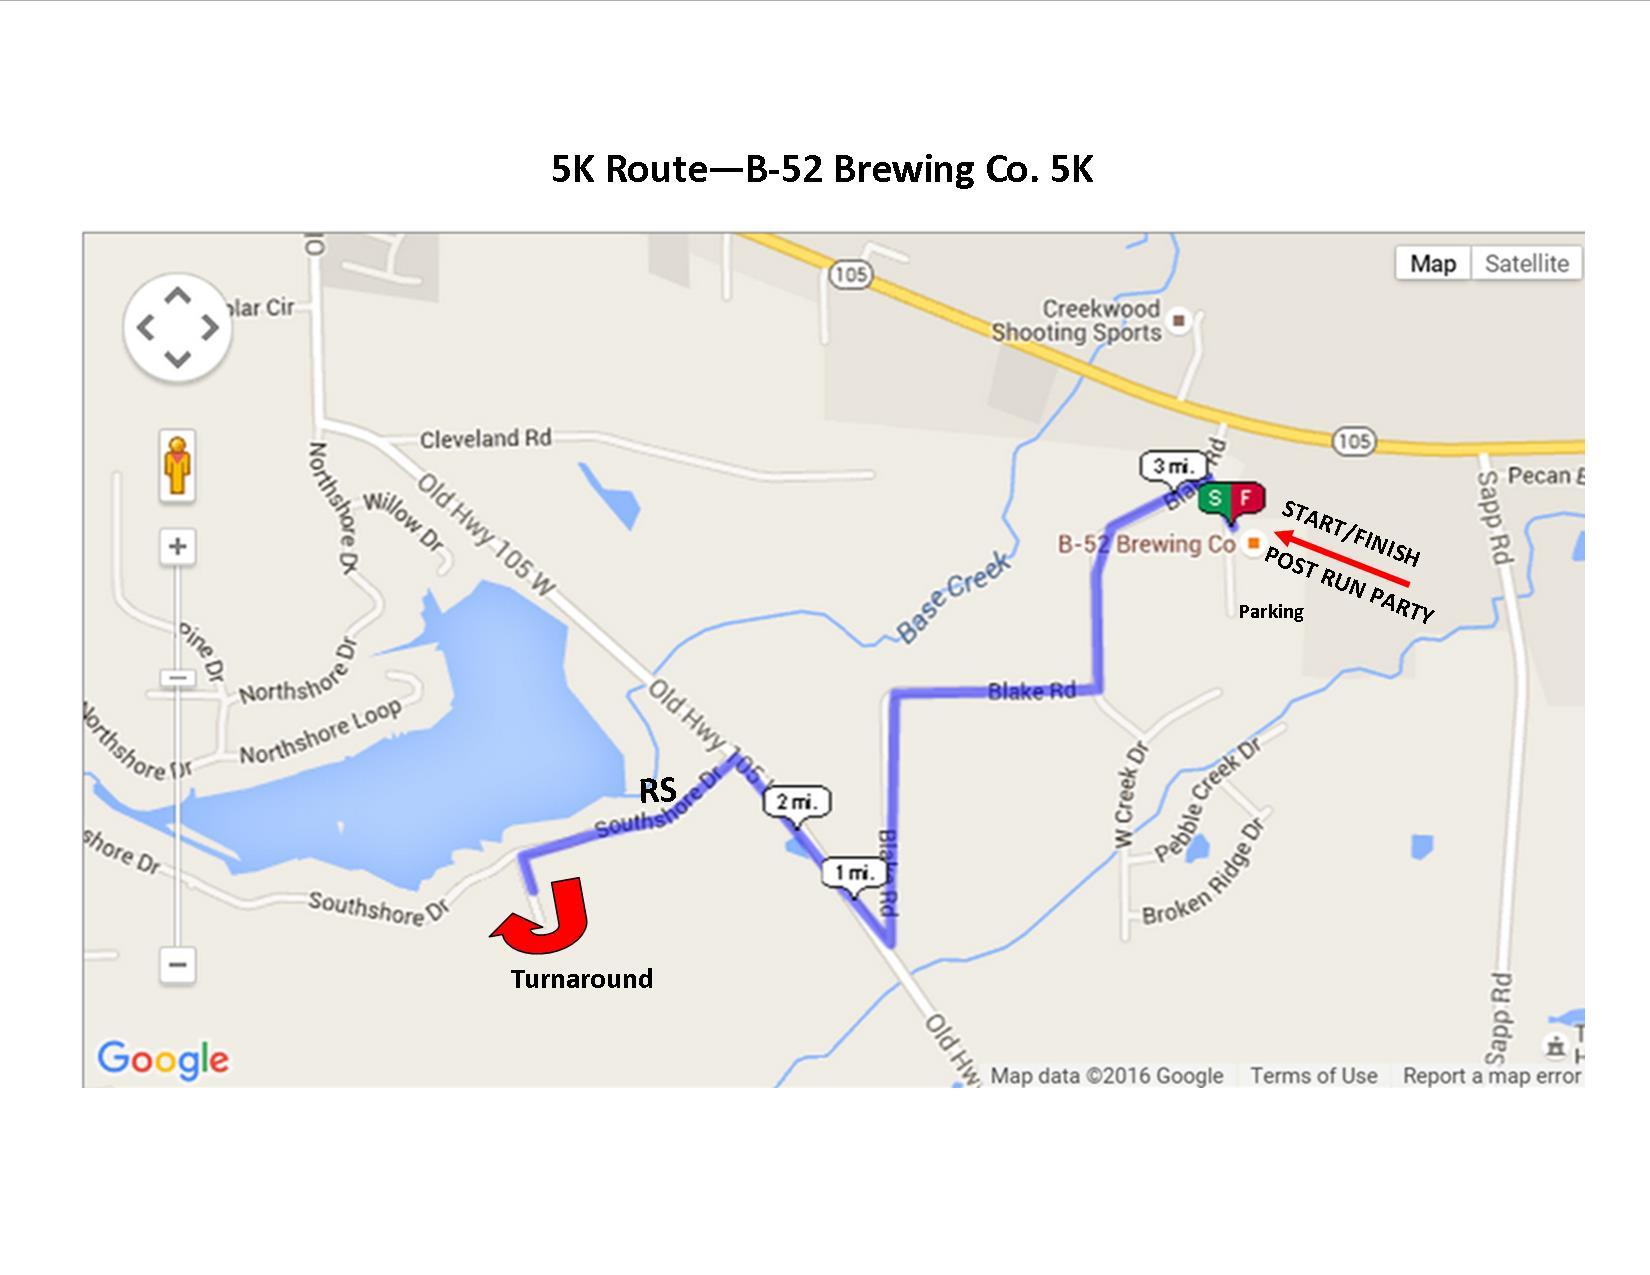 ADA & B-52 Brewery 5K Run - Conroe, TX 2016 | ACTIVE